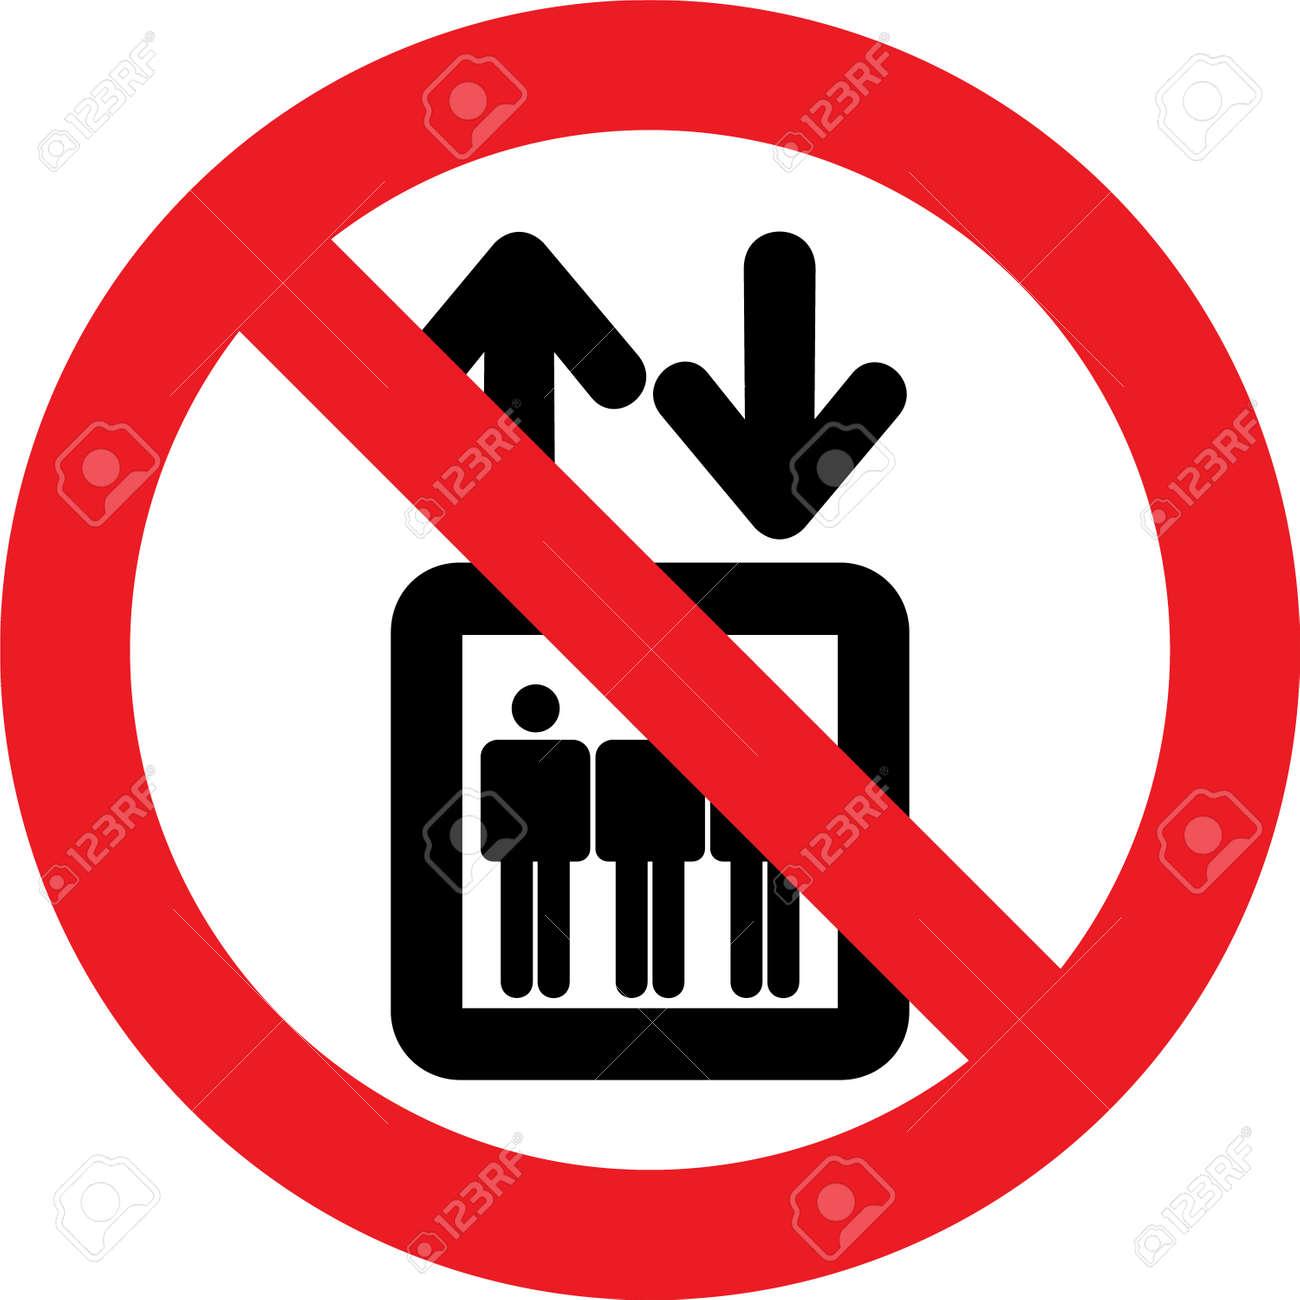 No elevator allowed sign - 72366068